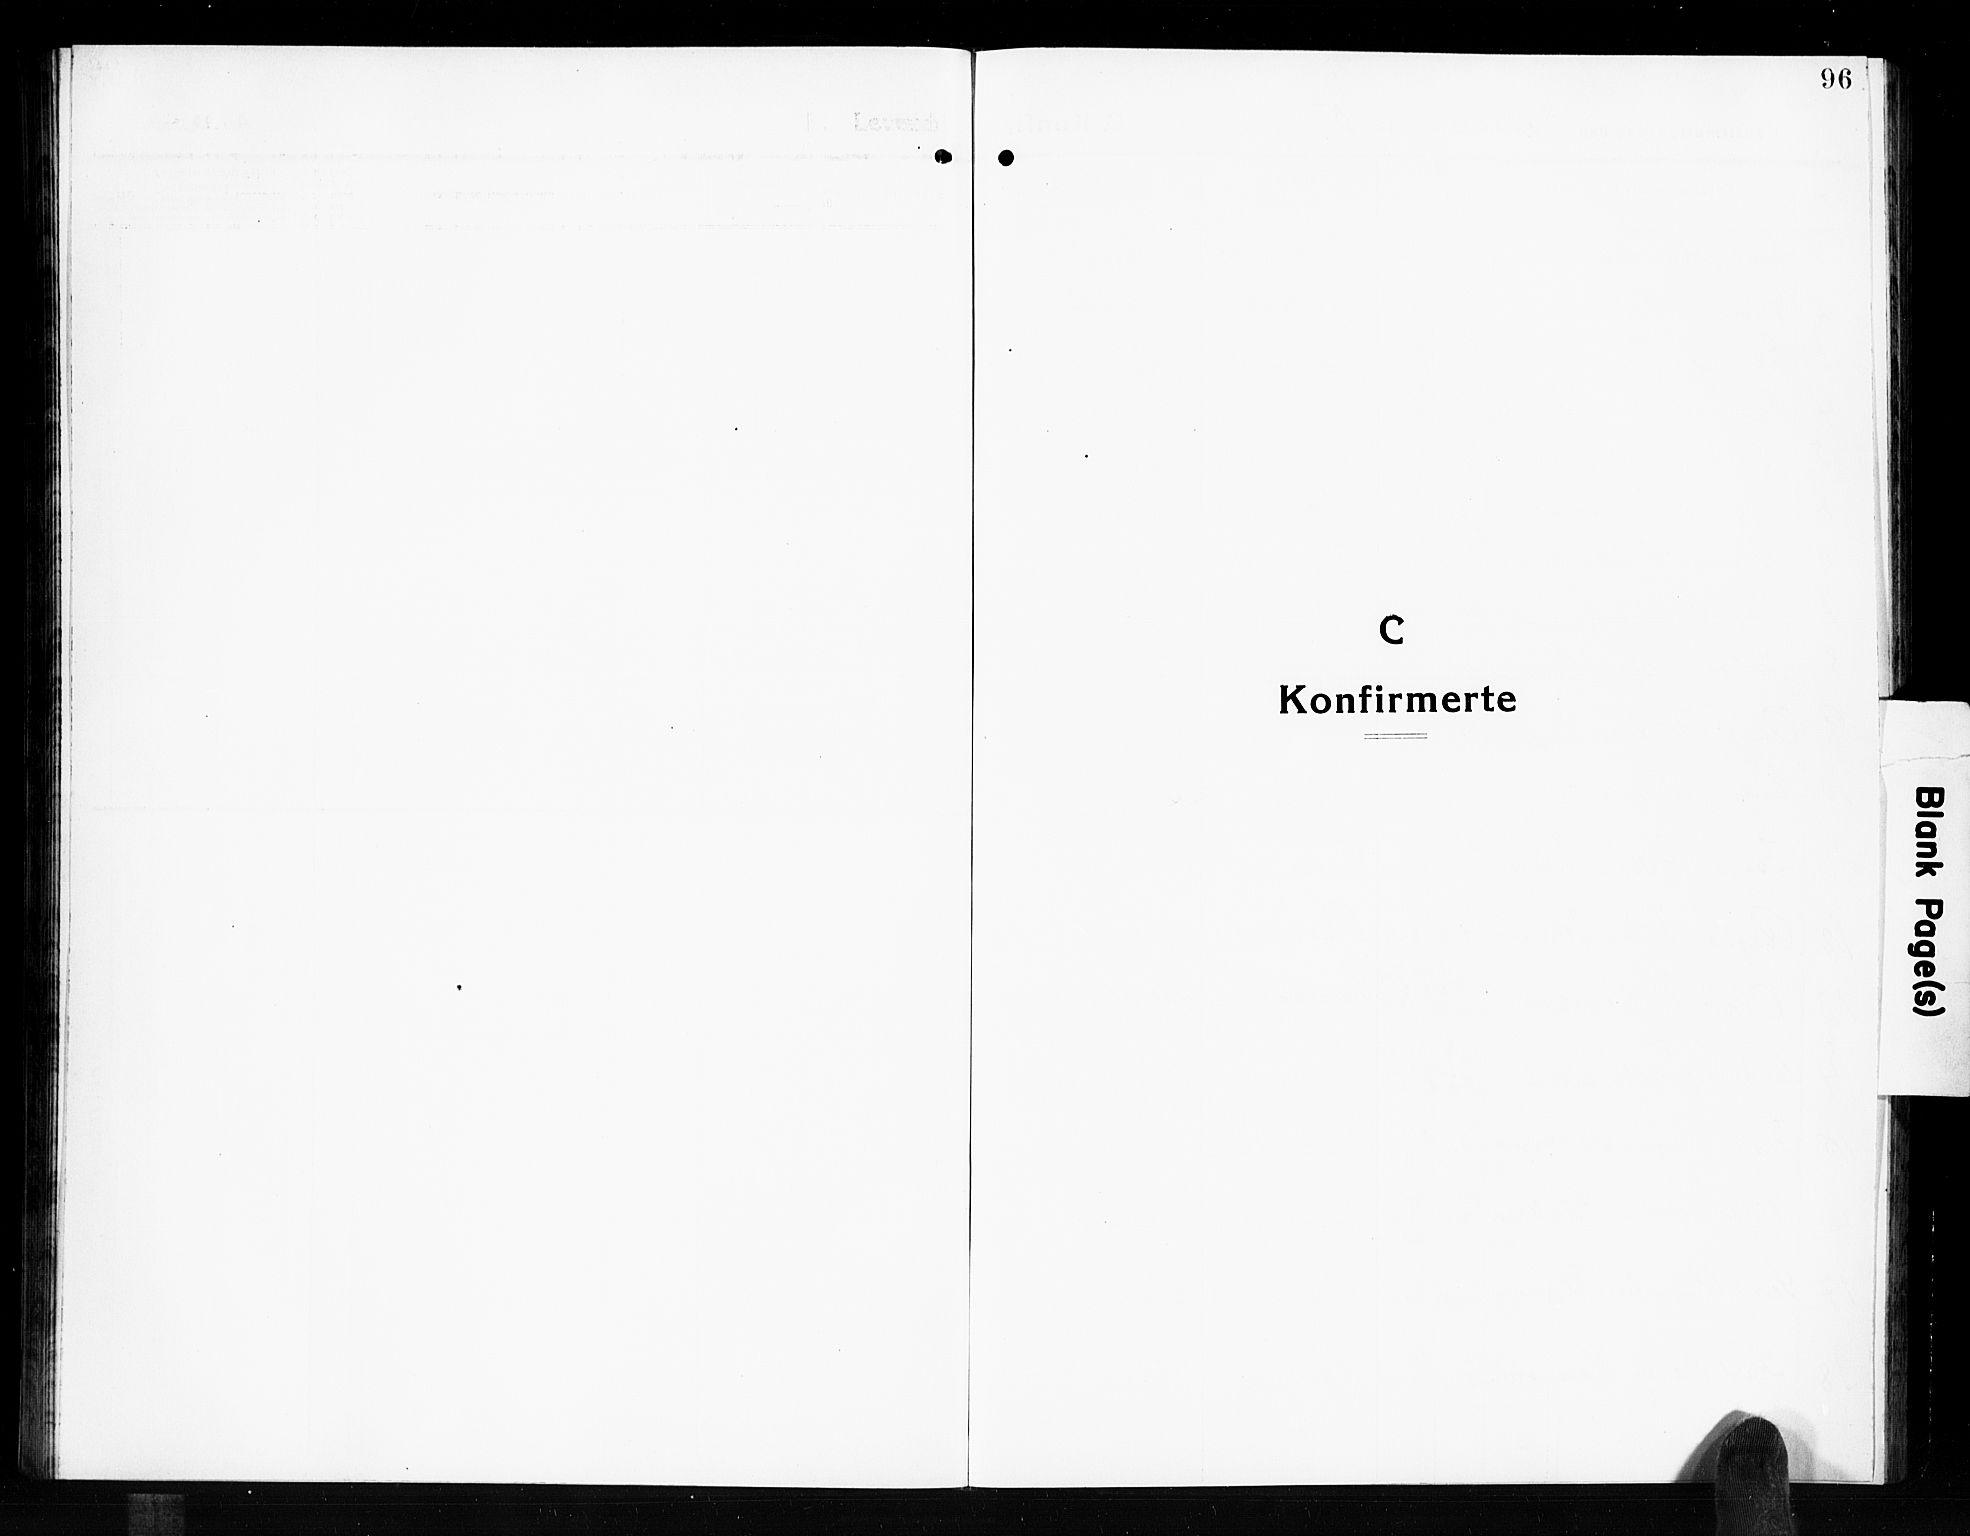 SAKO, Solum kirkebøker, G/Gb/L0006: Klokkerbok nr. II 6, 1915-1927, s. 96